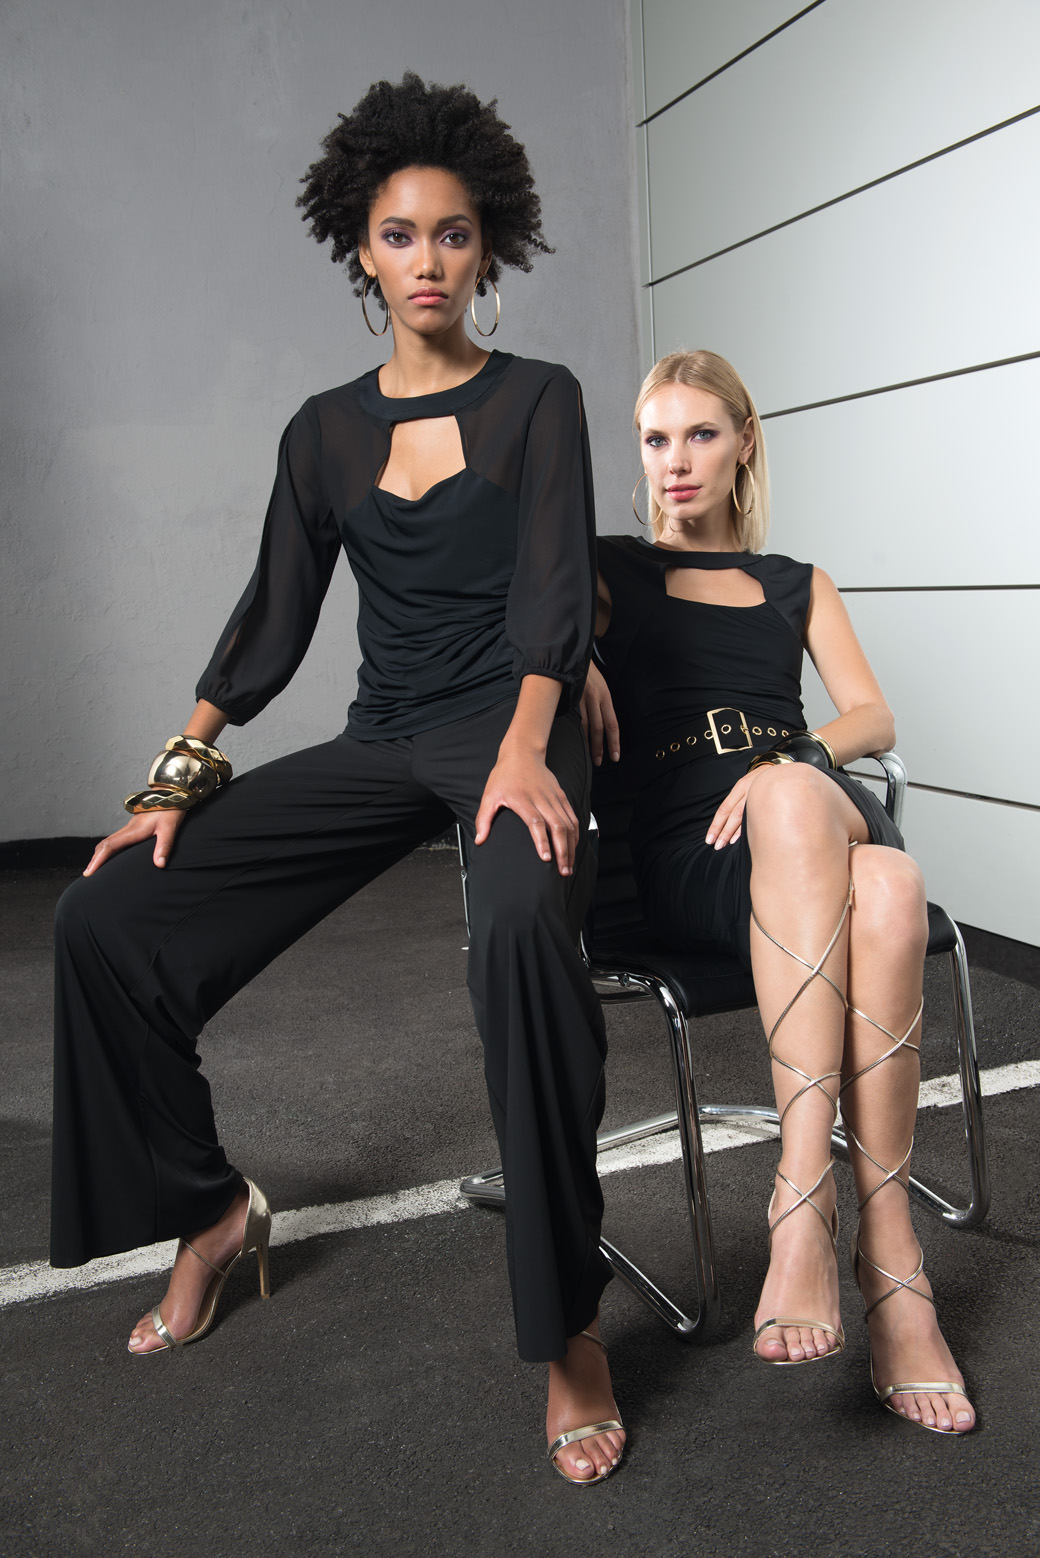 Luxuryamp; Collection Italia Edas Collection Aai Aai Italia Aai Collection Edas Luxuryamp; Luxuryamp; srCdthxQ